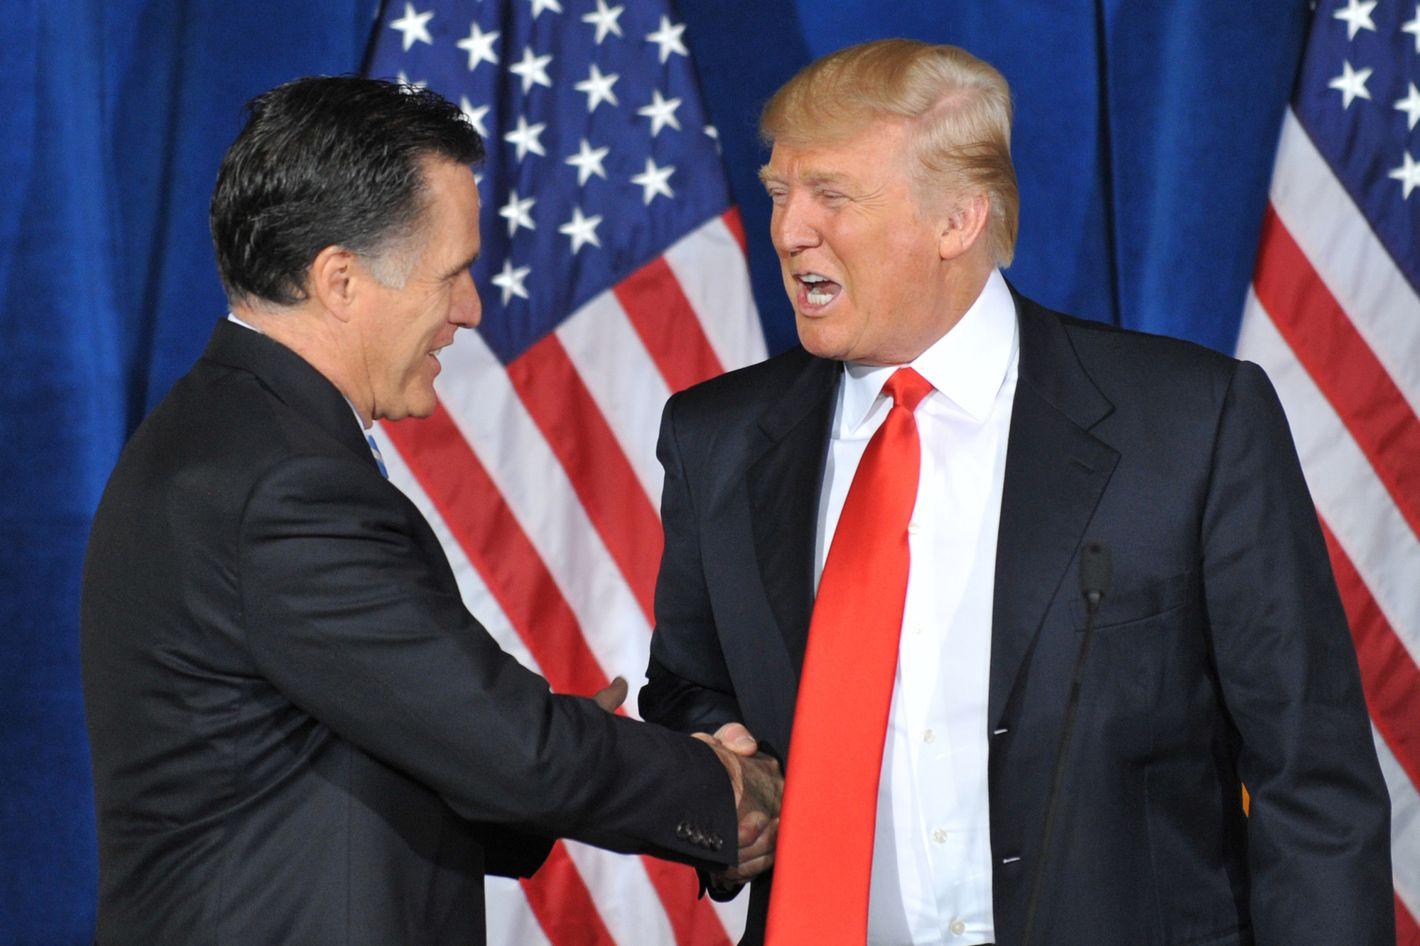 Businessman Donald Trump (R) shakes hands with Republican presidential hopeful Mitt Romney